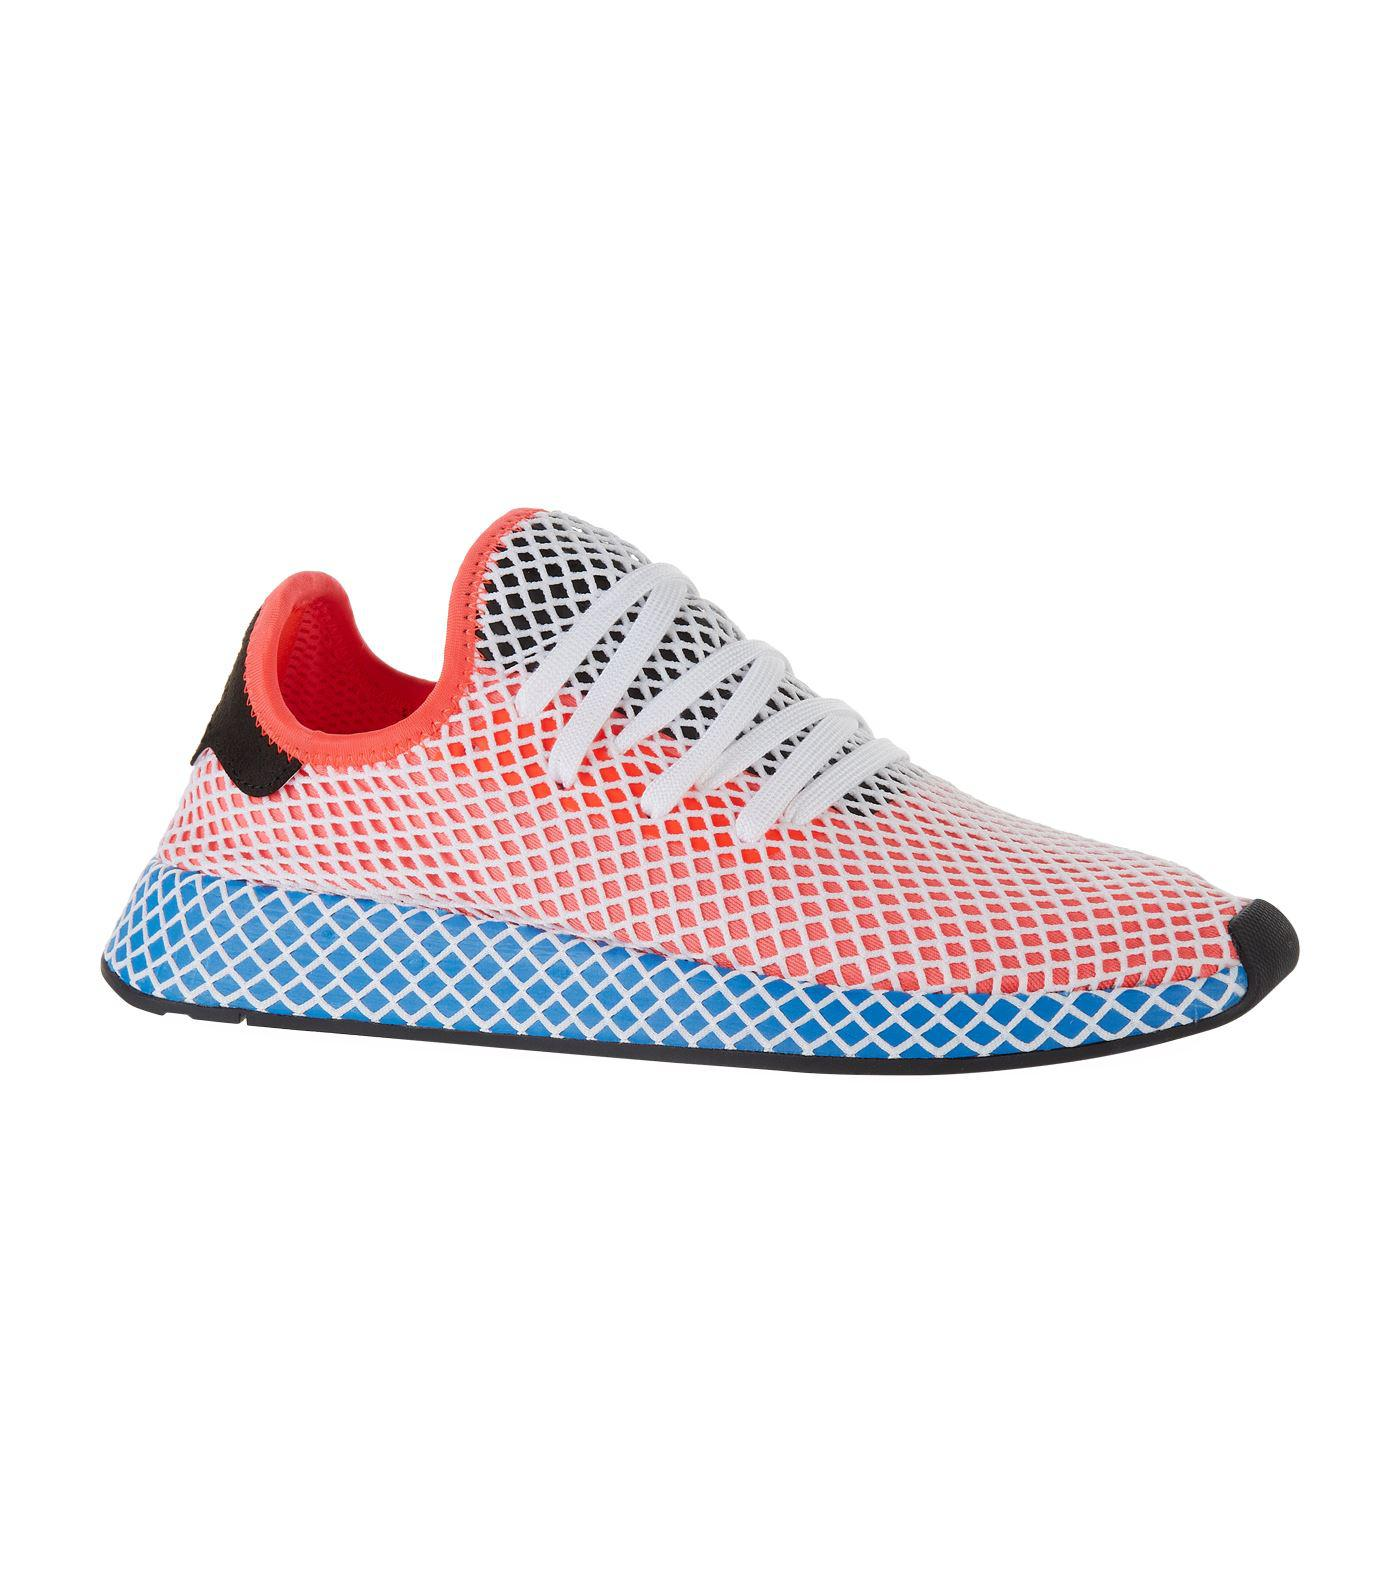 adidas originali deerupt runner formatori in rosso lyst